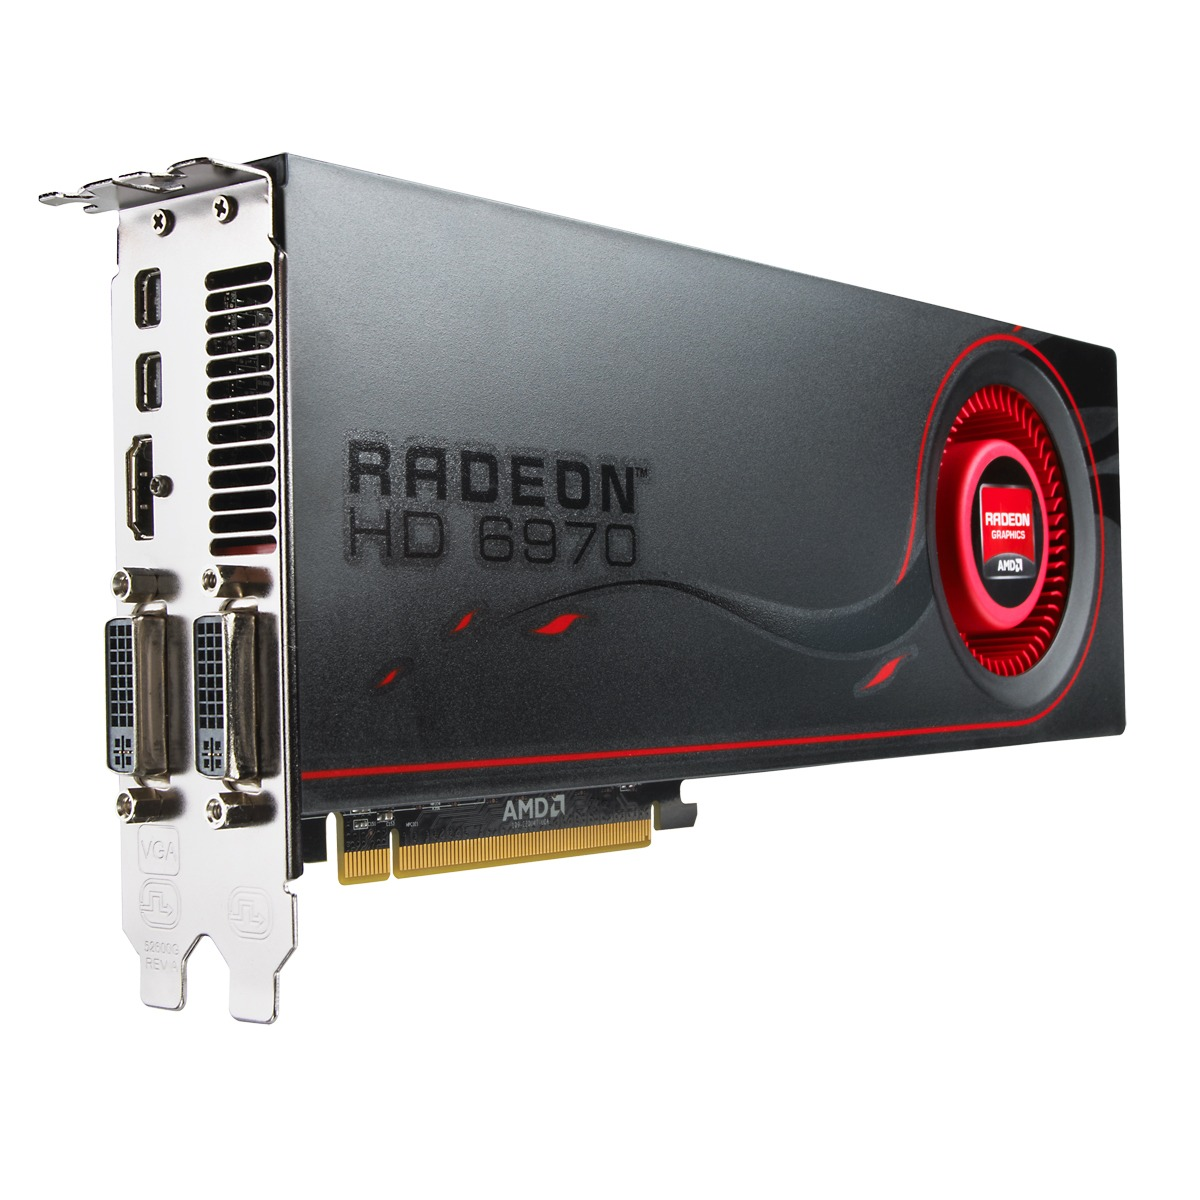 Carte graphique AMD Radeon HD 6970 2 GB AMD Radeon HD 6970 - 2 Go HDMI/Dual DVI/Dual Mini-DisplayPort - PCI Express (AMD Radeon HD 6970)